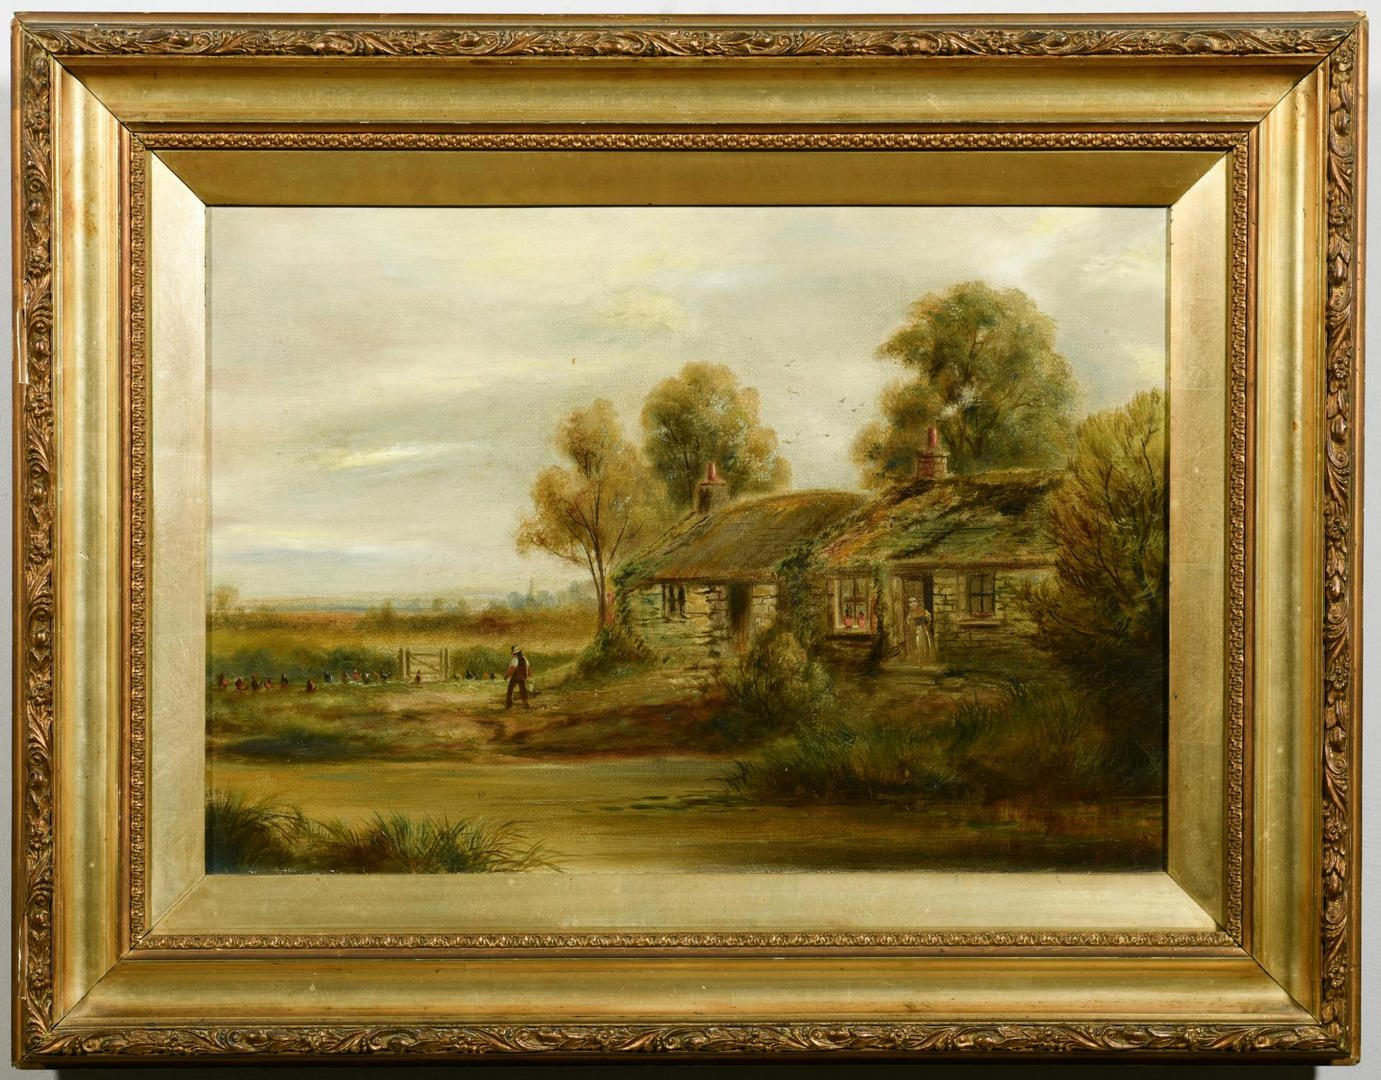 Lot 443: Signed Oil on Canvas Farmstead Scene